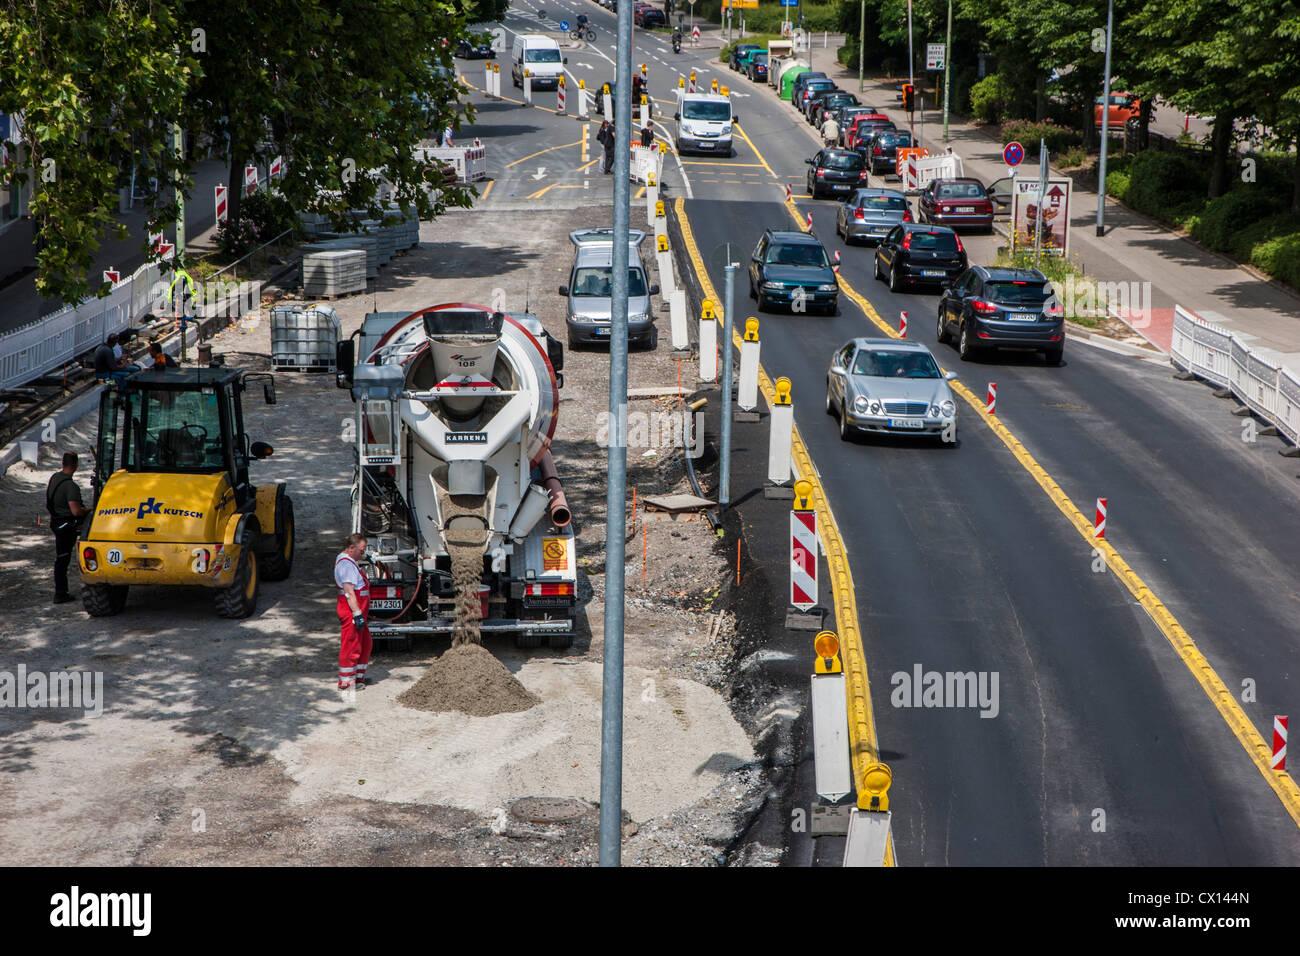 Rebuilding of an inner city road. New asphalt surface. - Stock Image